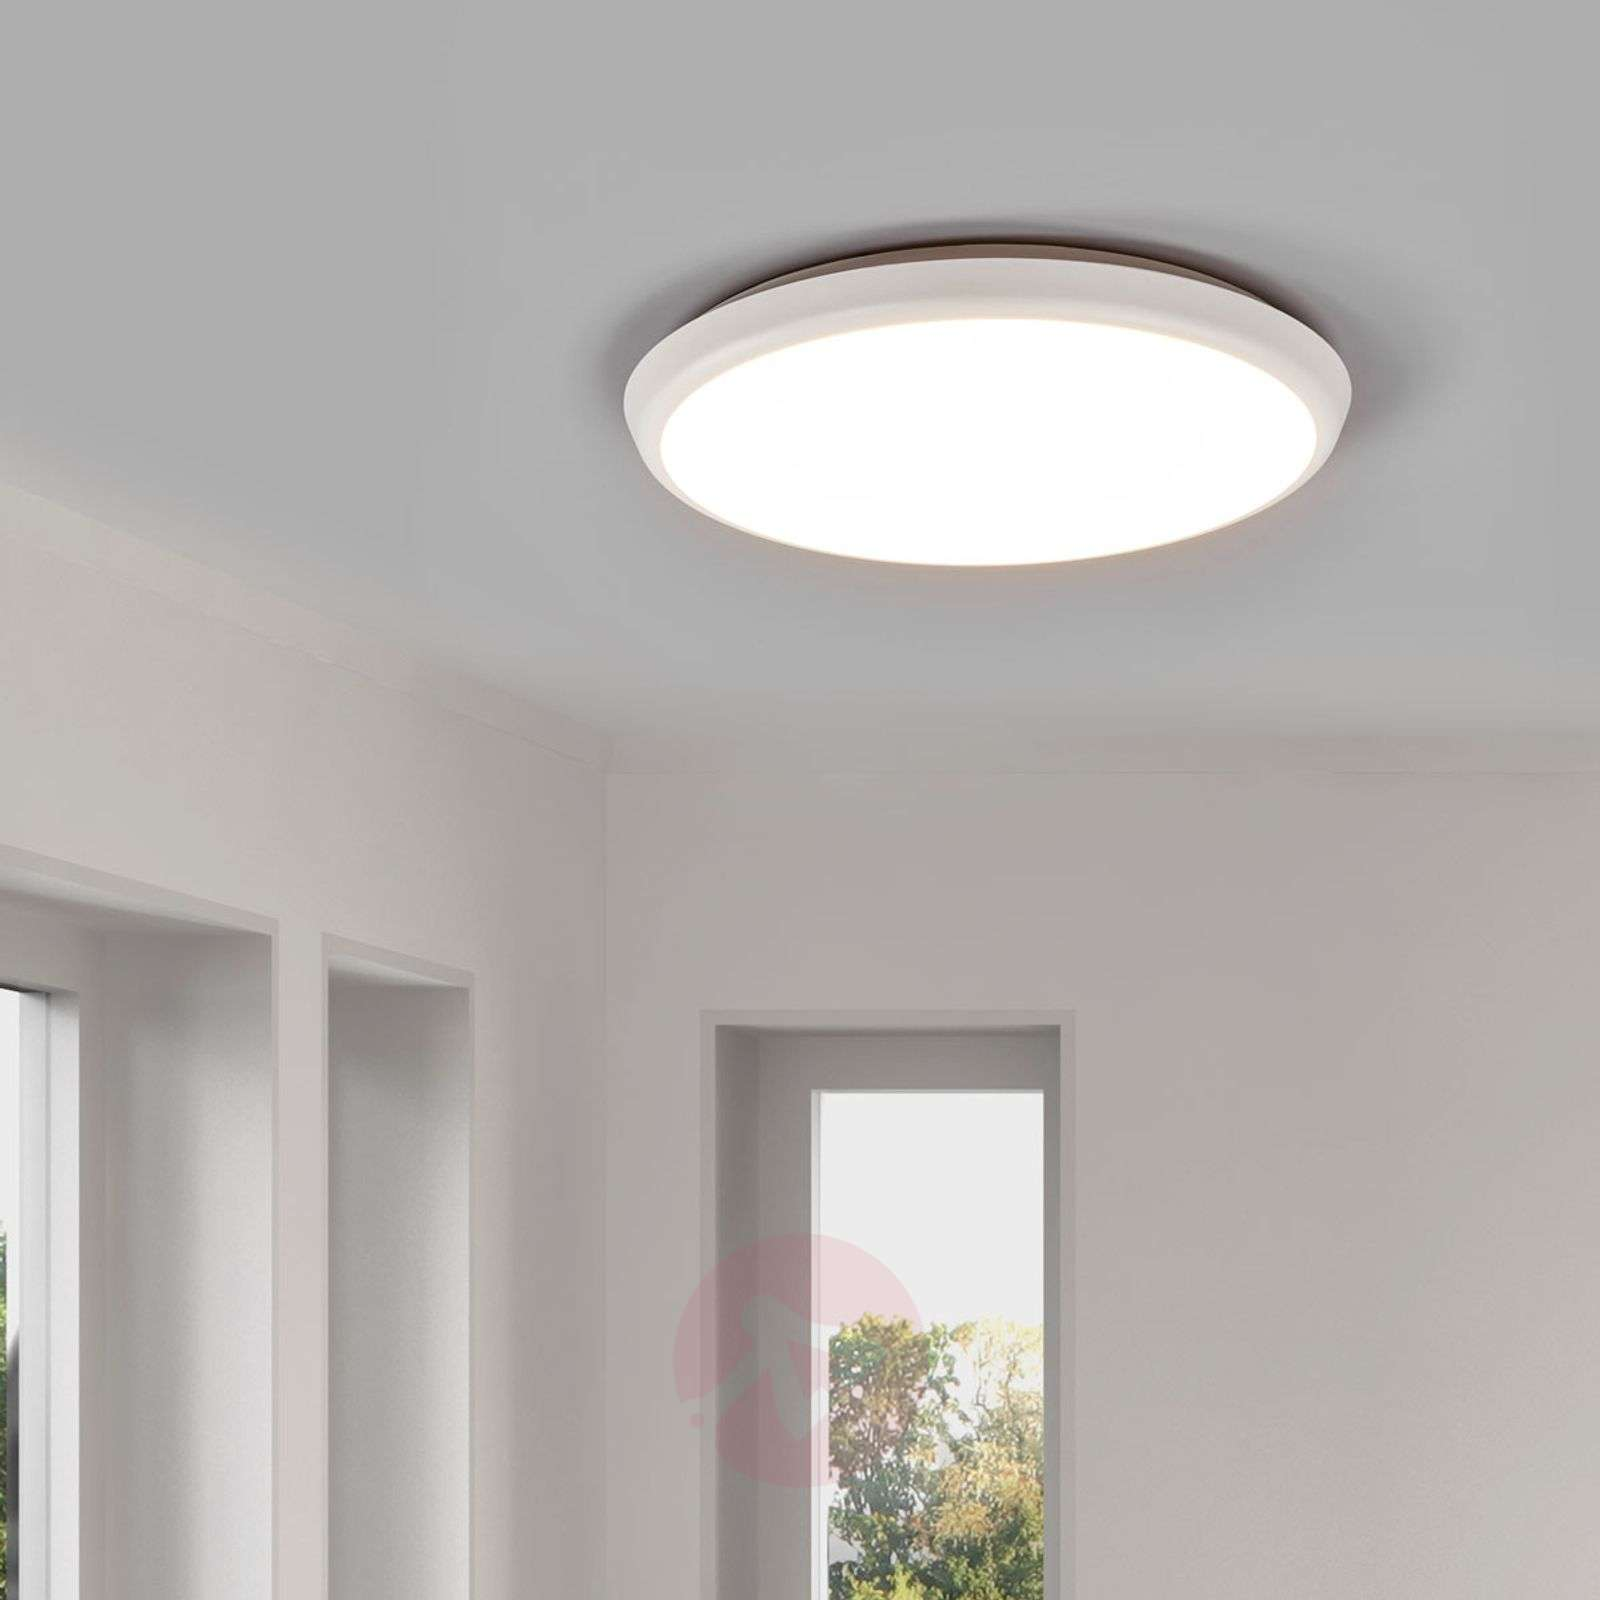 Simple LED ceiling lamp Augustin, 30cm-9967013-09